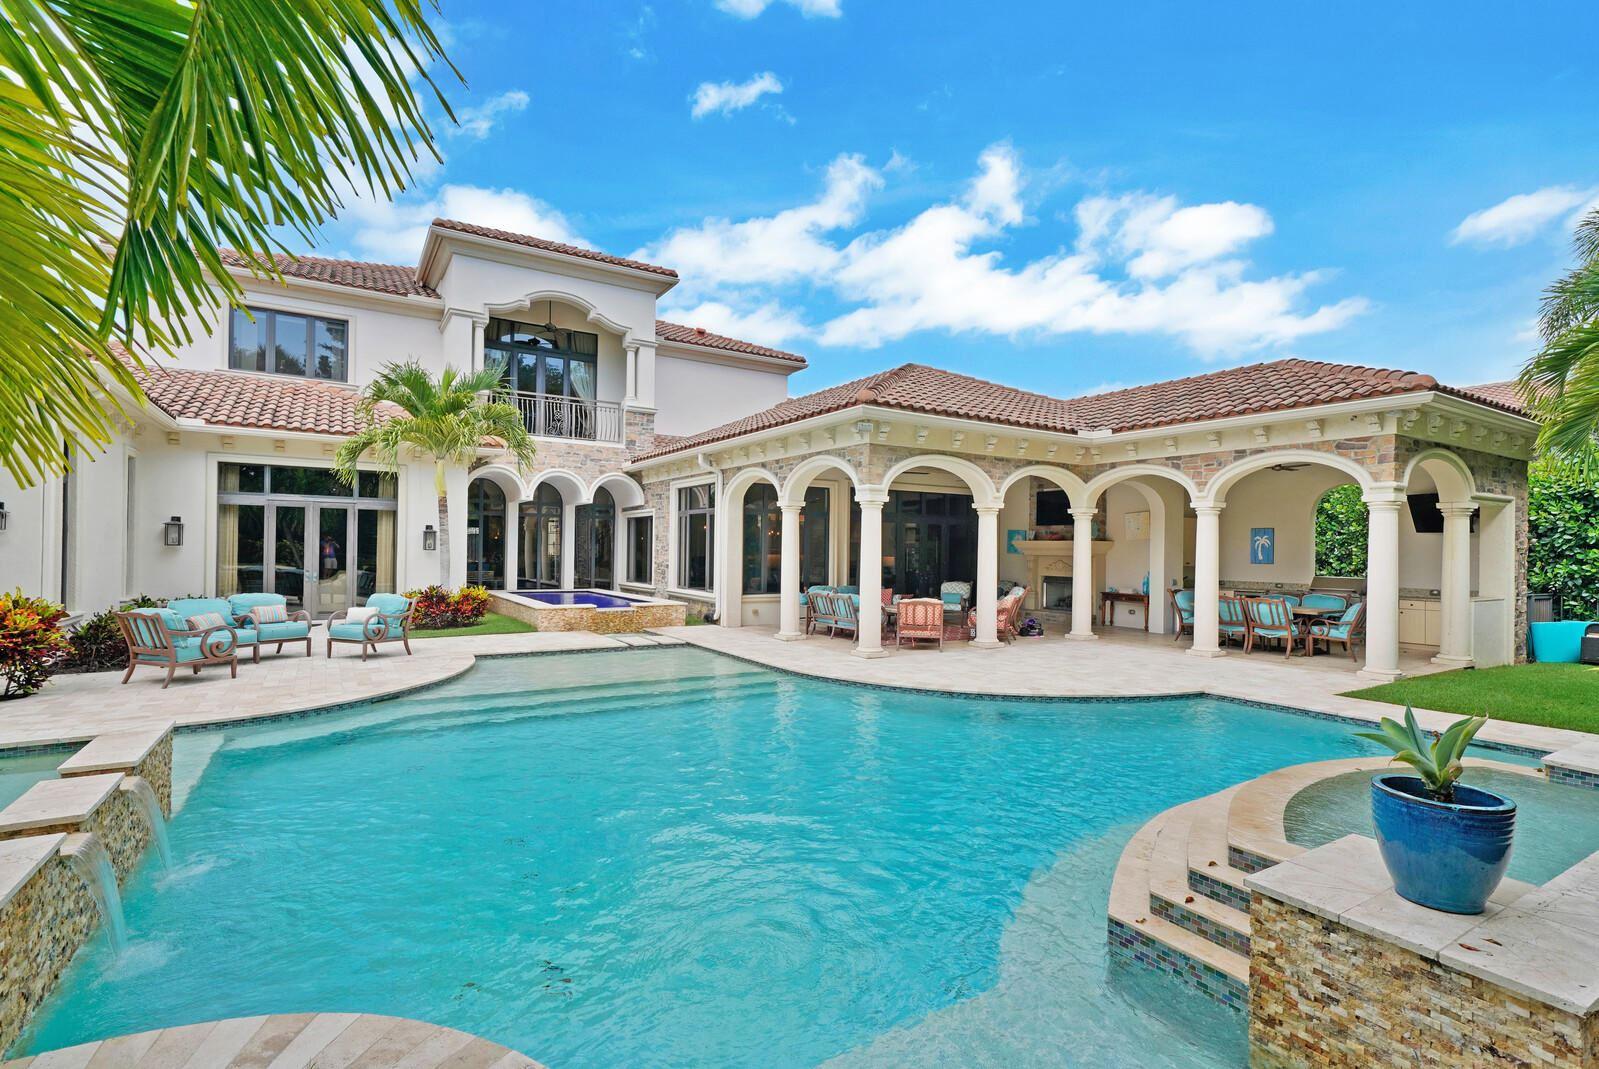 Photo of 649 Hermitage Circle, Palm Beach Gardens, FL 33410 (MLS # RX-10716156)